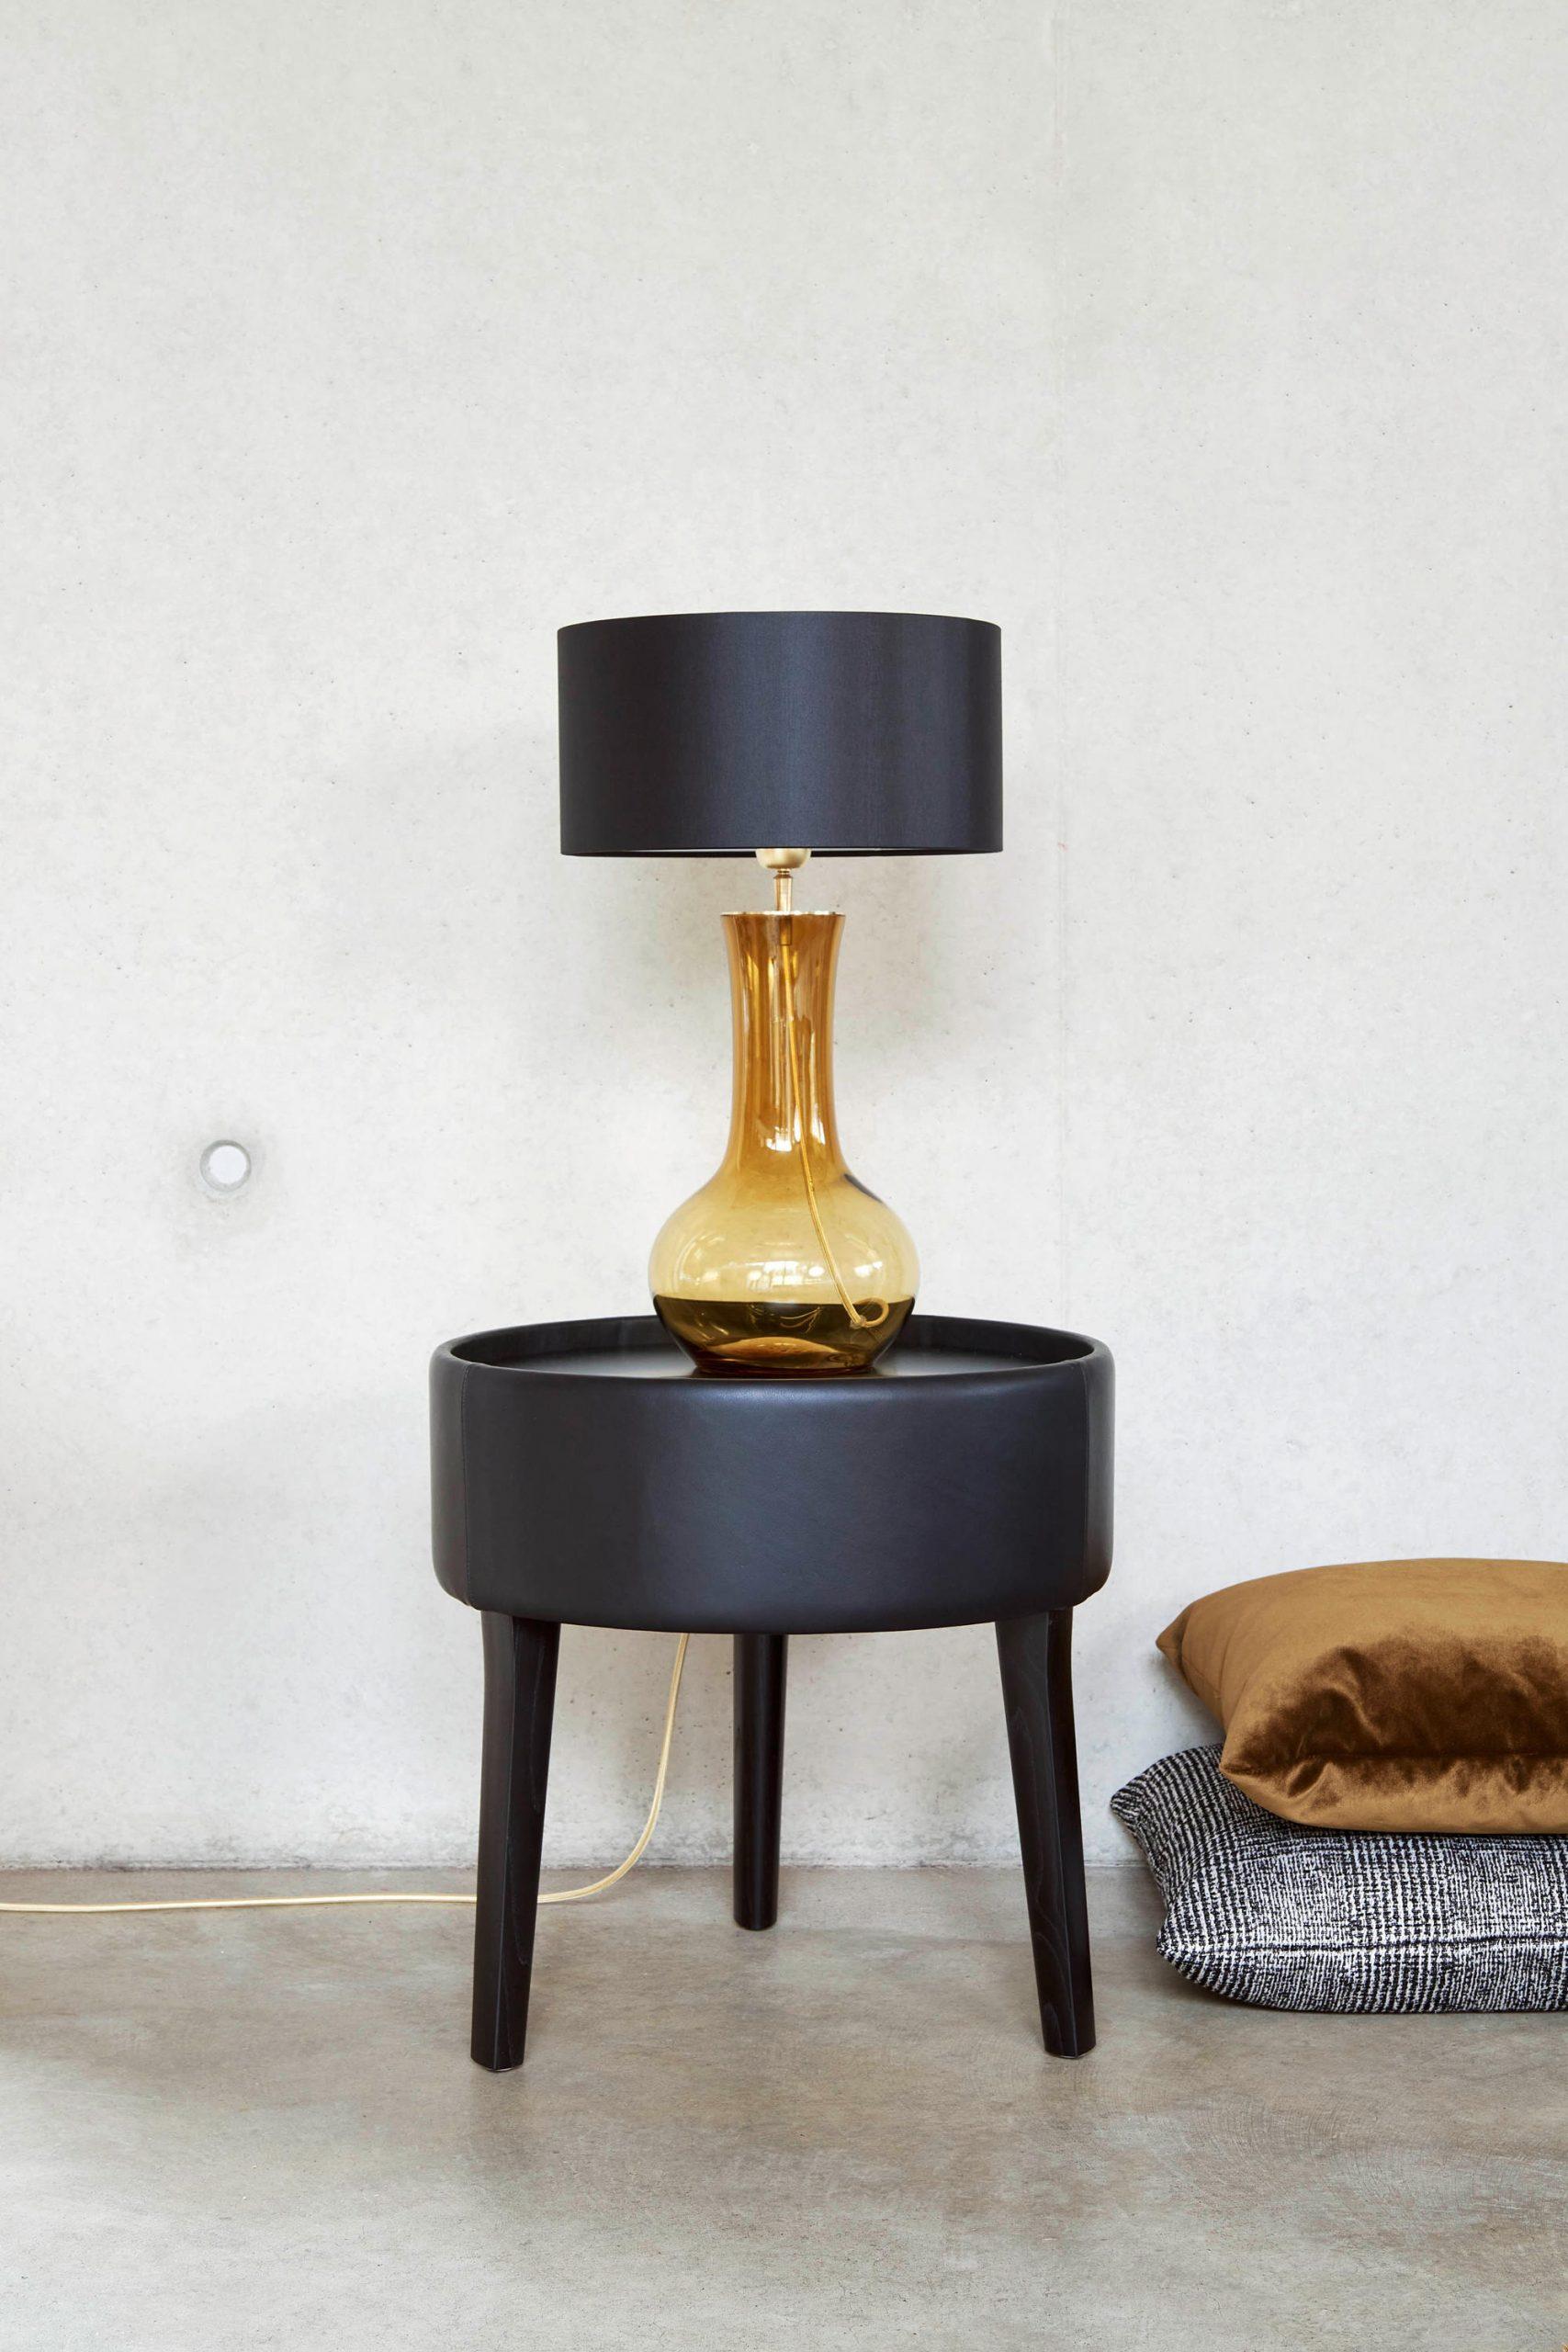 Starlight Table Lamp by Bielefelder Werkstaetten